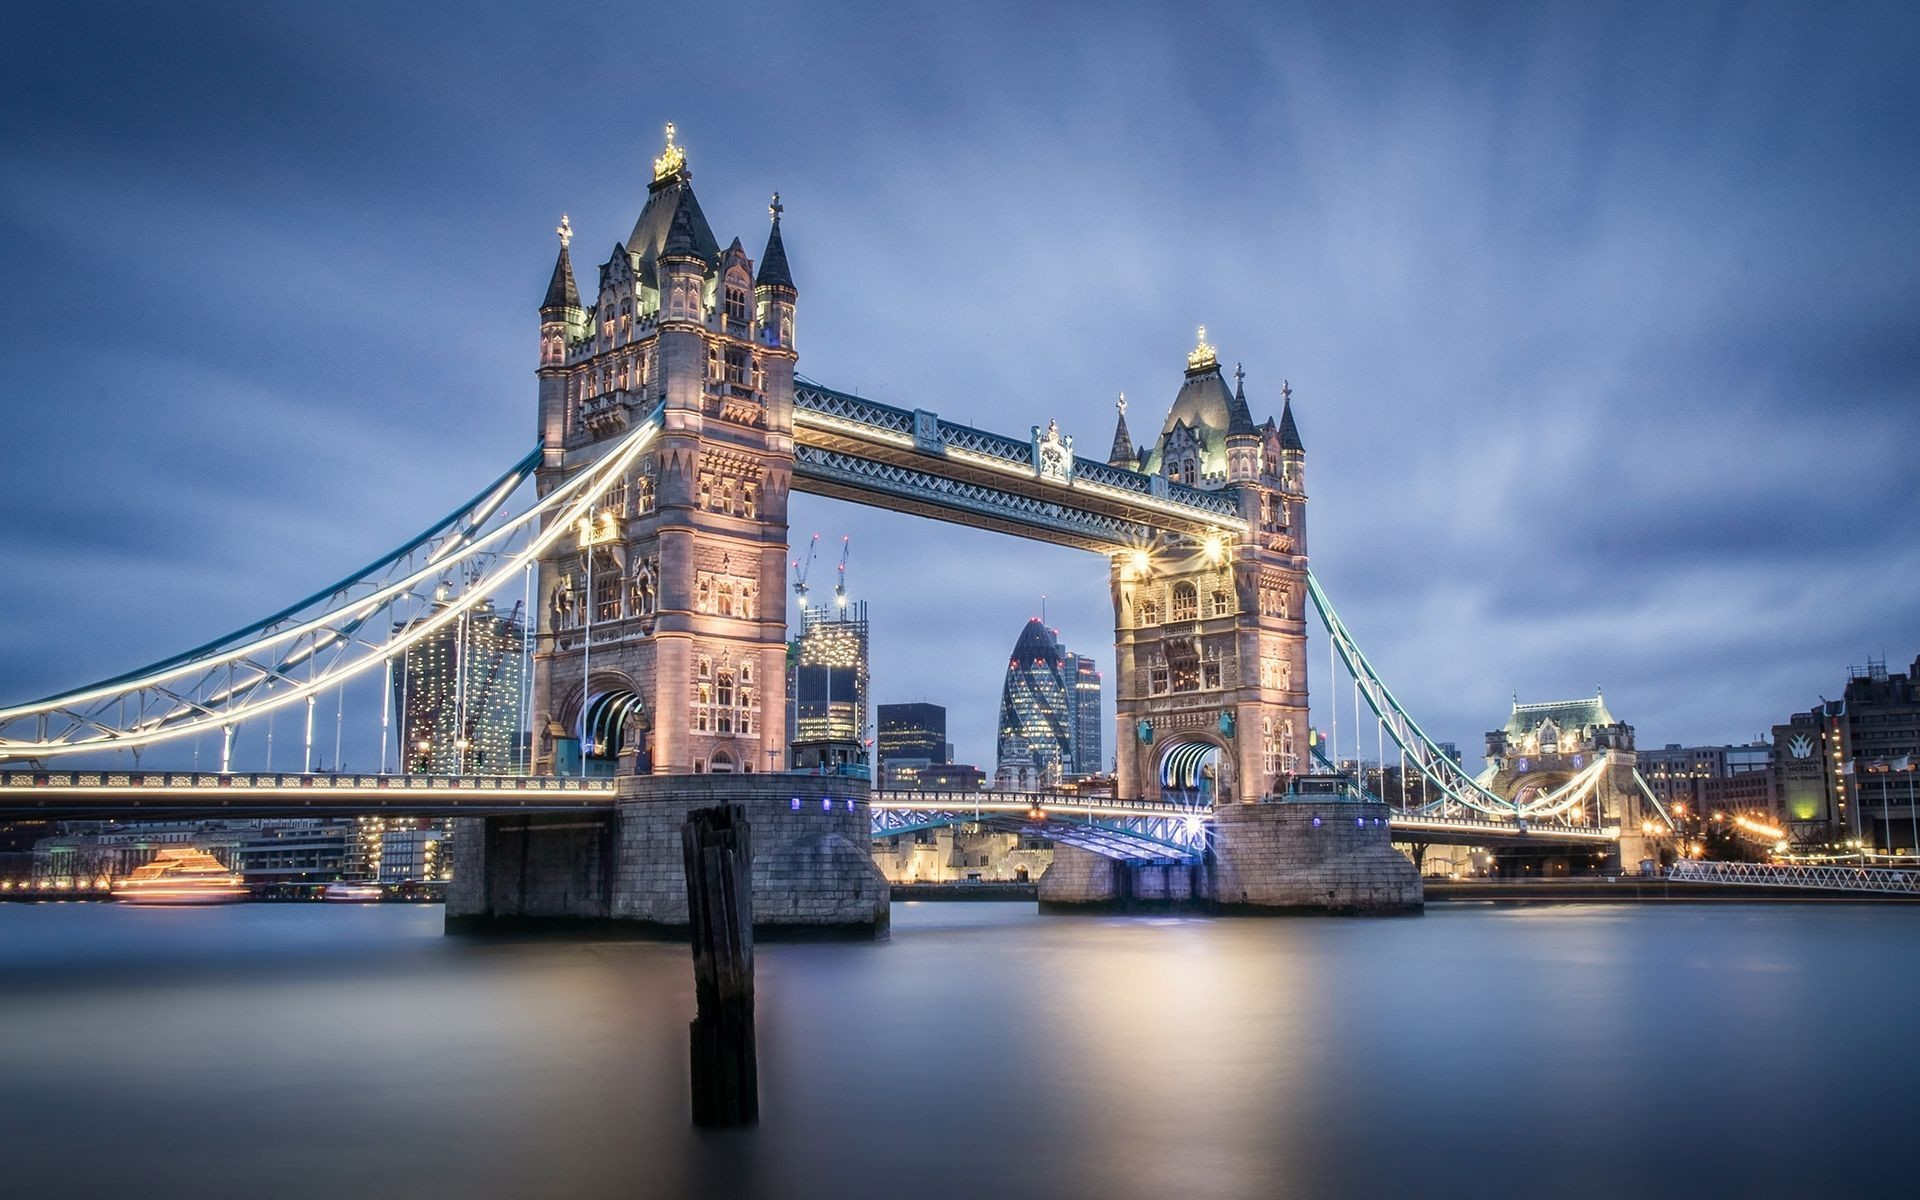 Res: 1920x1200, Tower Bridge HD Wallpaper | Tower Bridge Images Free | Cool Wallpapers